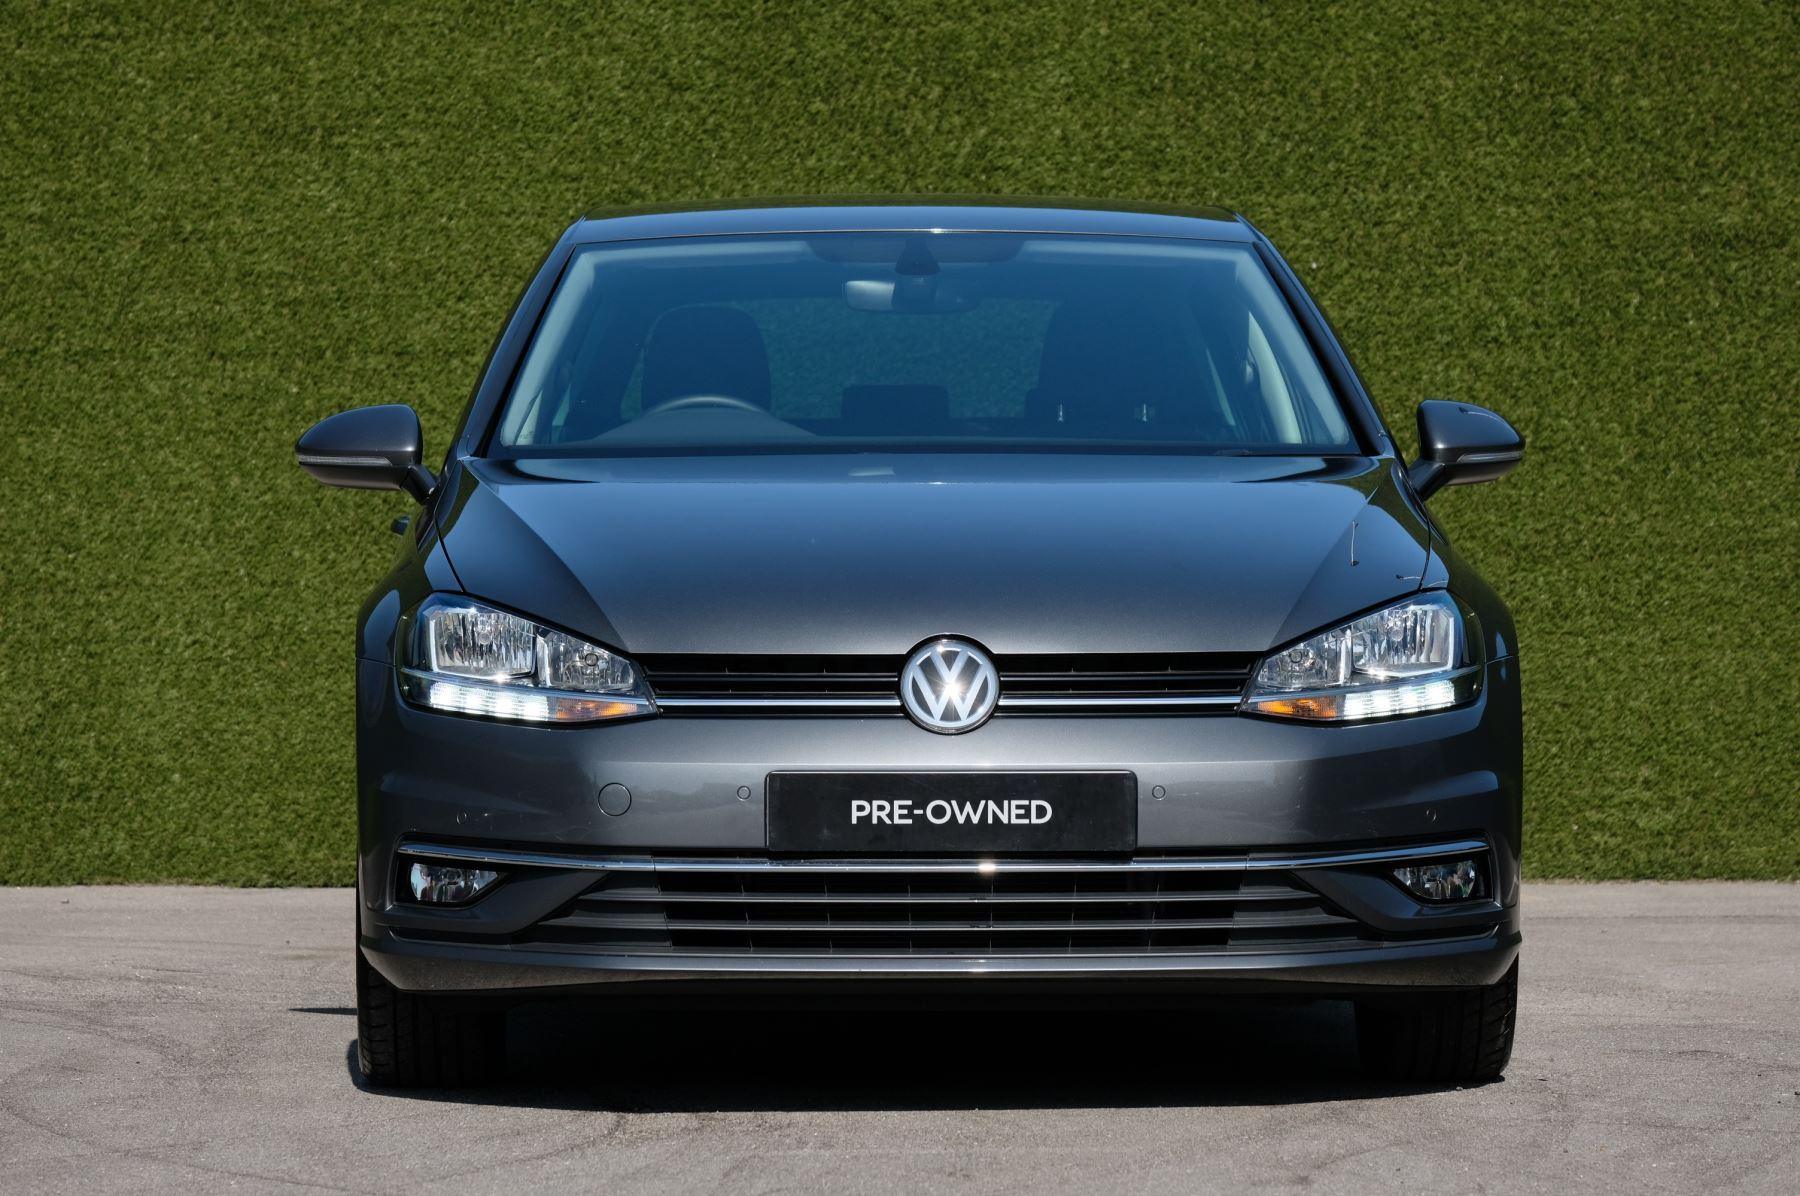 Volkswagen Golf 1.5 TSI EVO 150hp Match 5 Door DSG Auto with A/Con, Sat Nav, Alloys & Adaptive Cruise  image 3